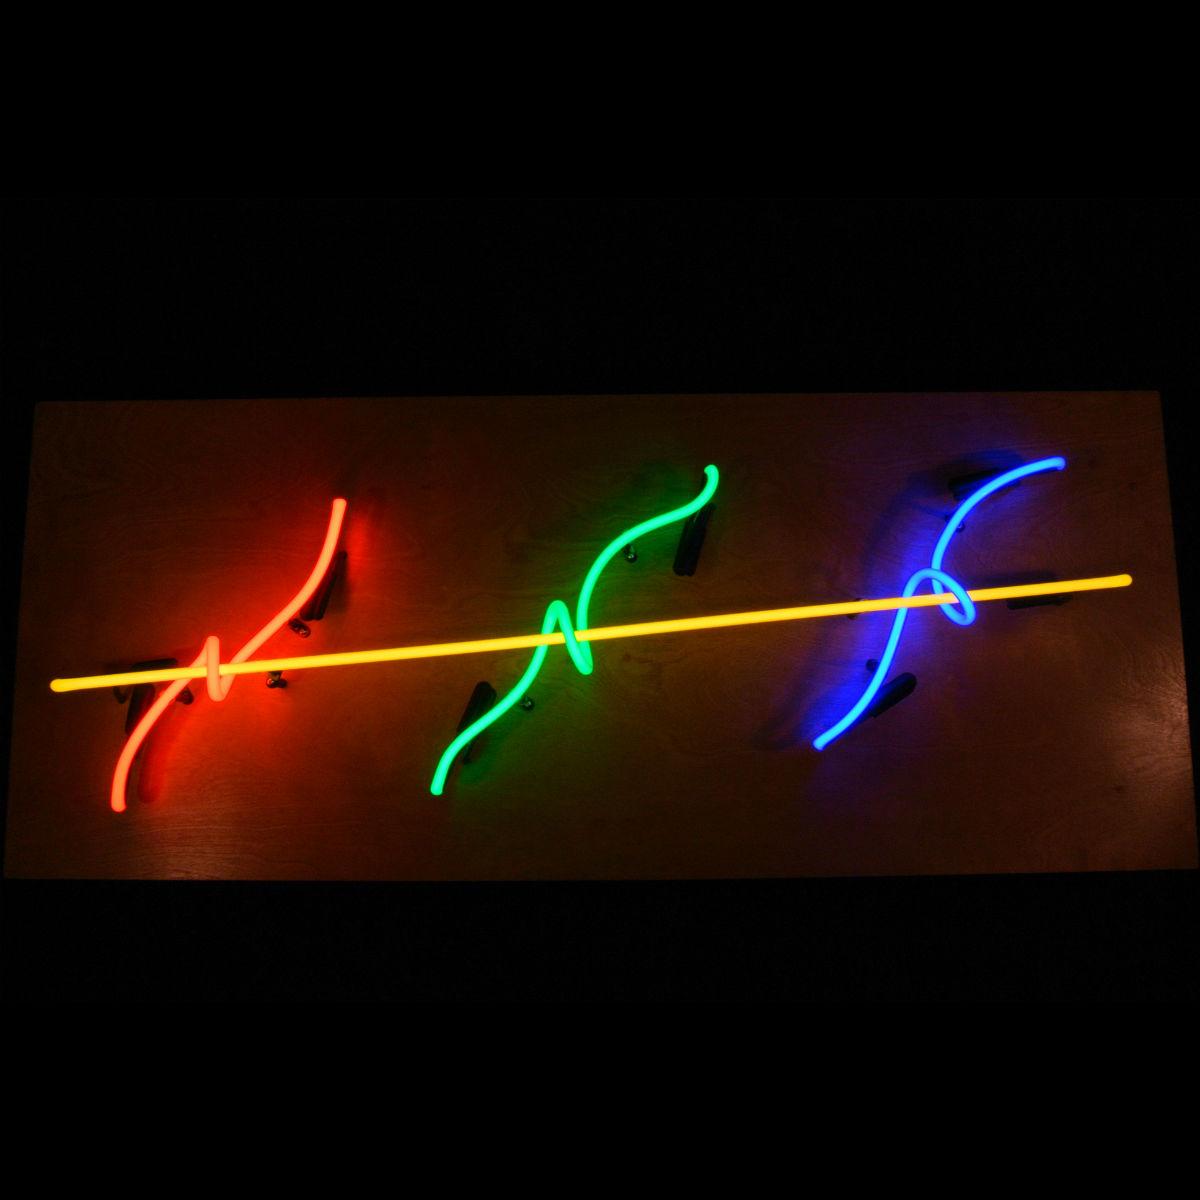 """SPIRAL MAGIC"" - Three Dimensional Stained Italian Glass Neon Light Artwork by John Barton - BartonNeonMagic.com"